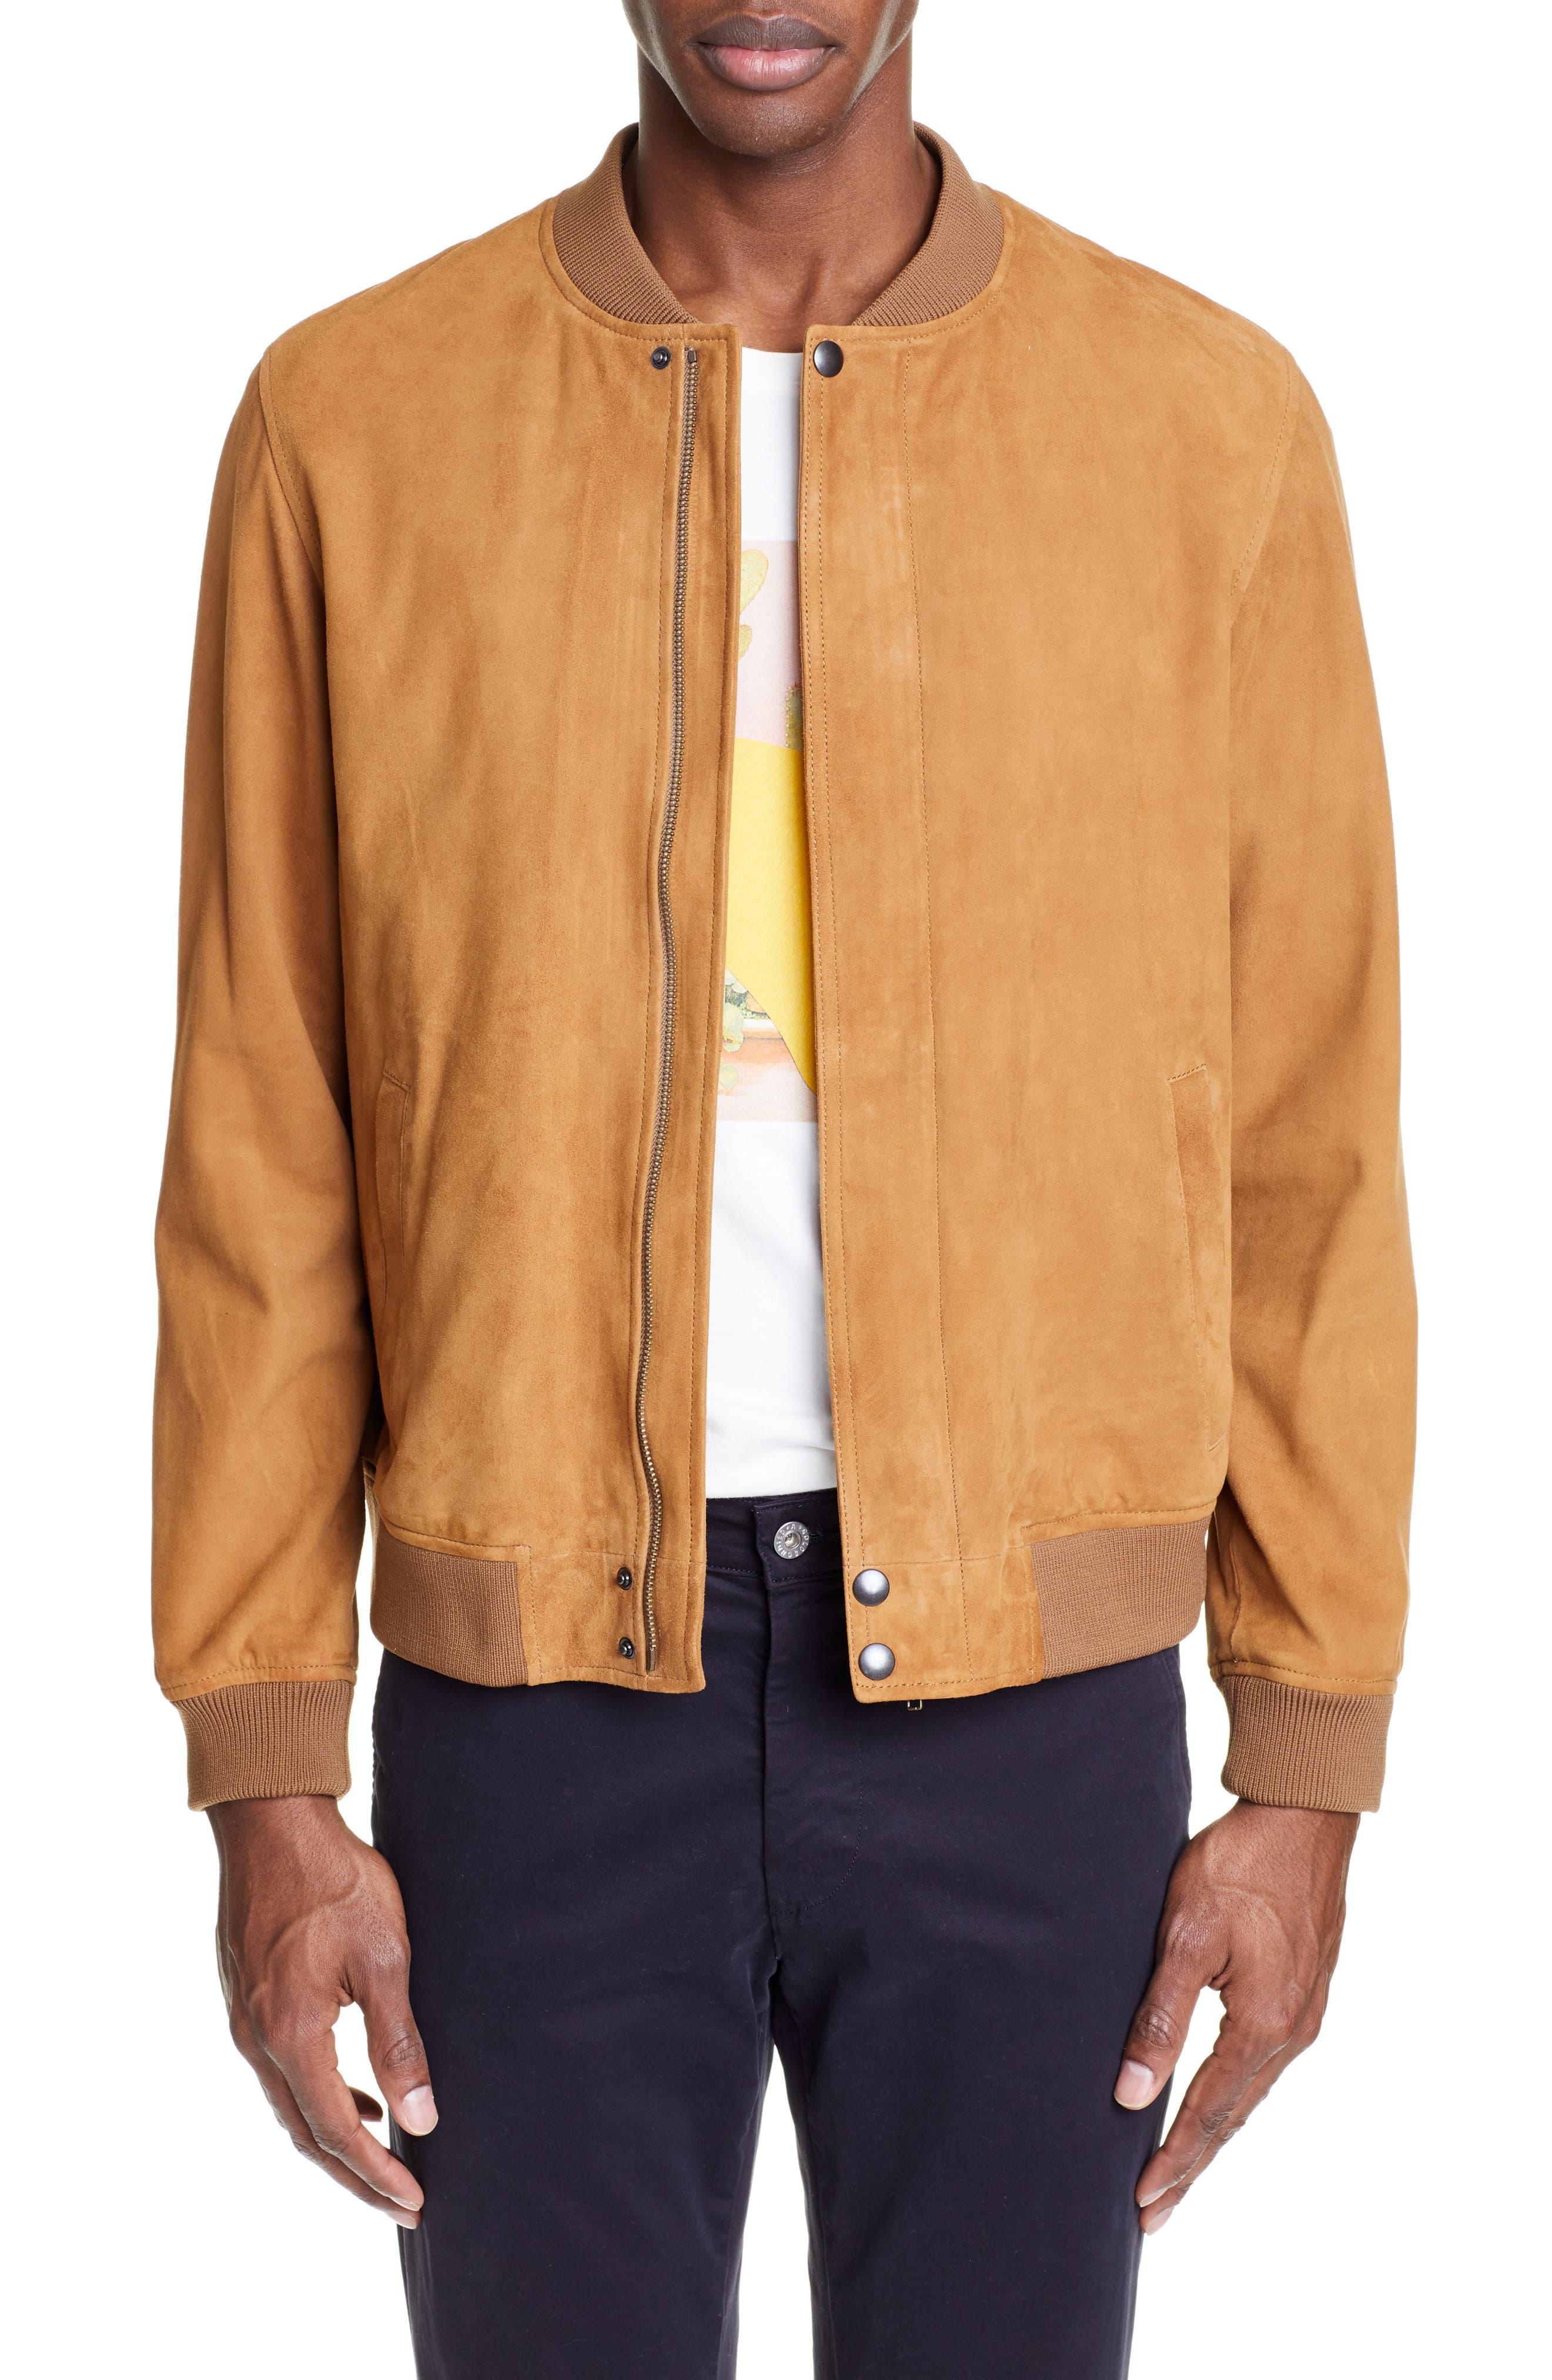 Editions Mr Jean-Paul Suede Jacket